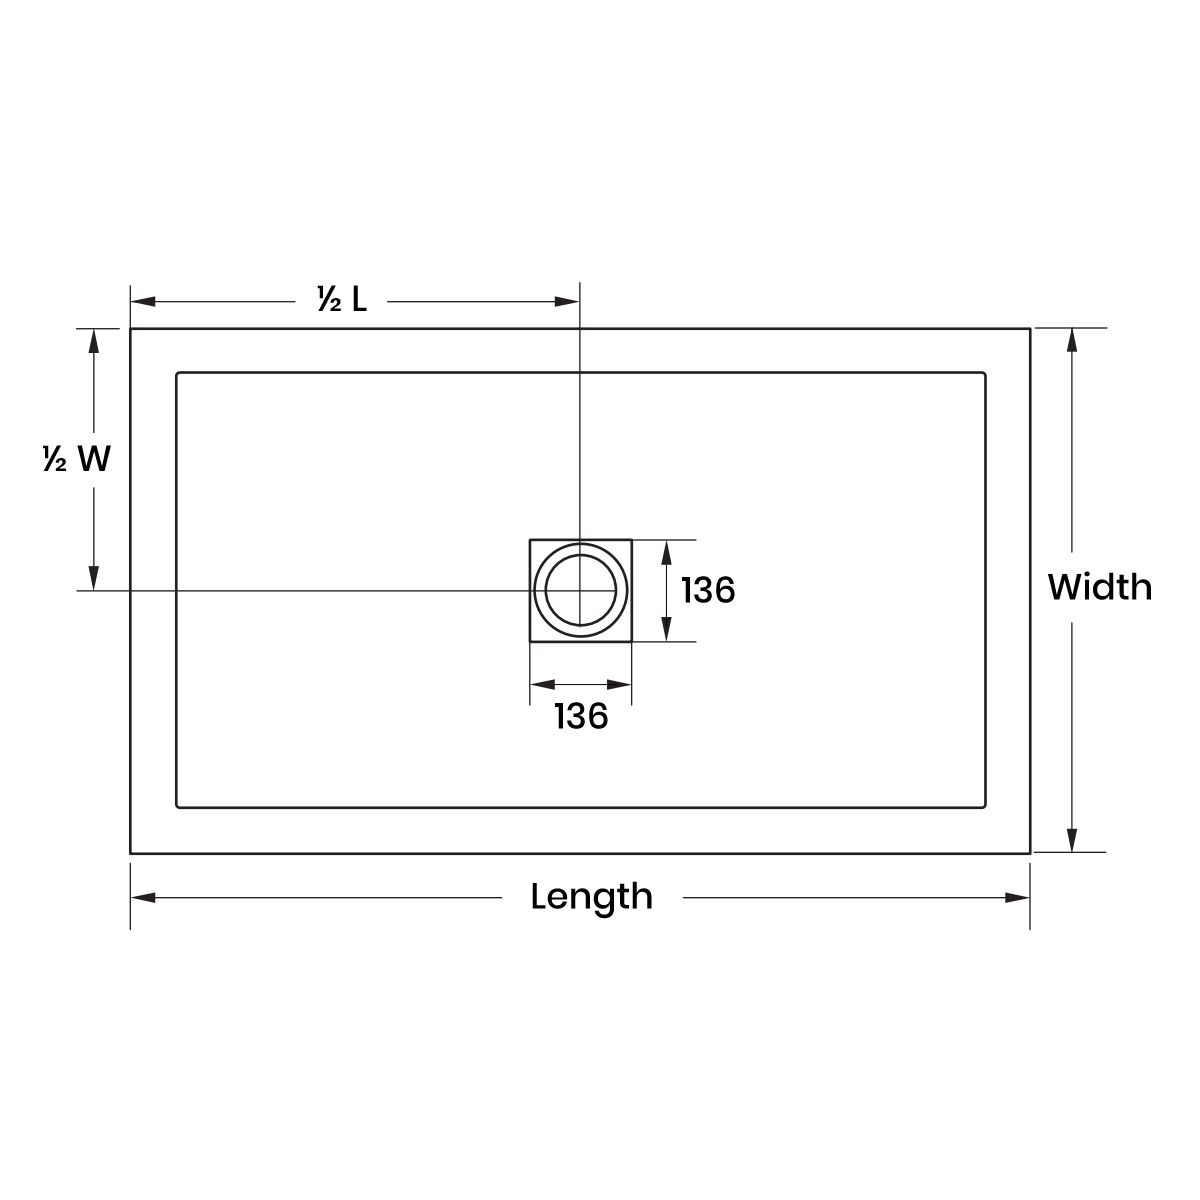 Aquadart White Slate Shower Tray 1500 x 760 Dimension